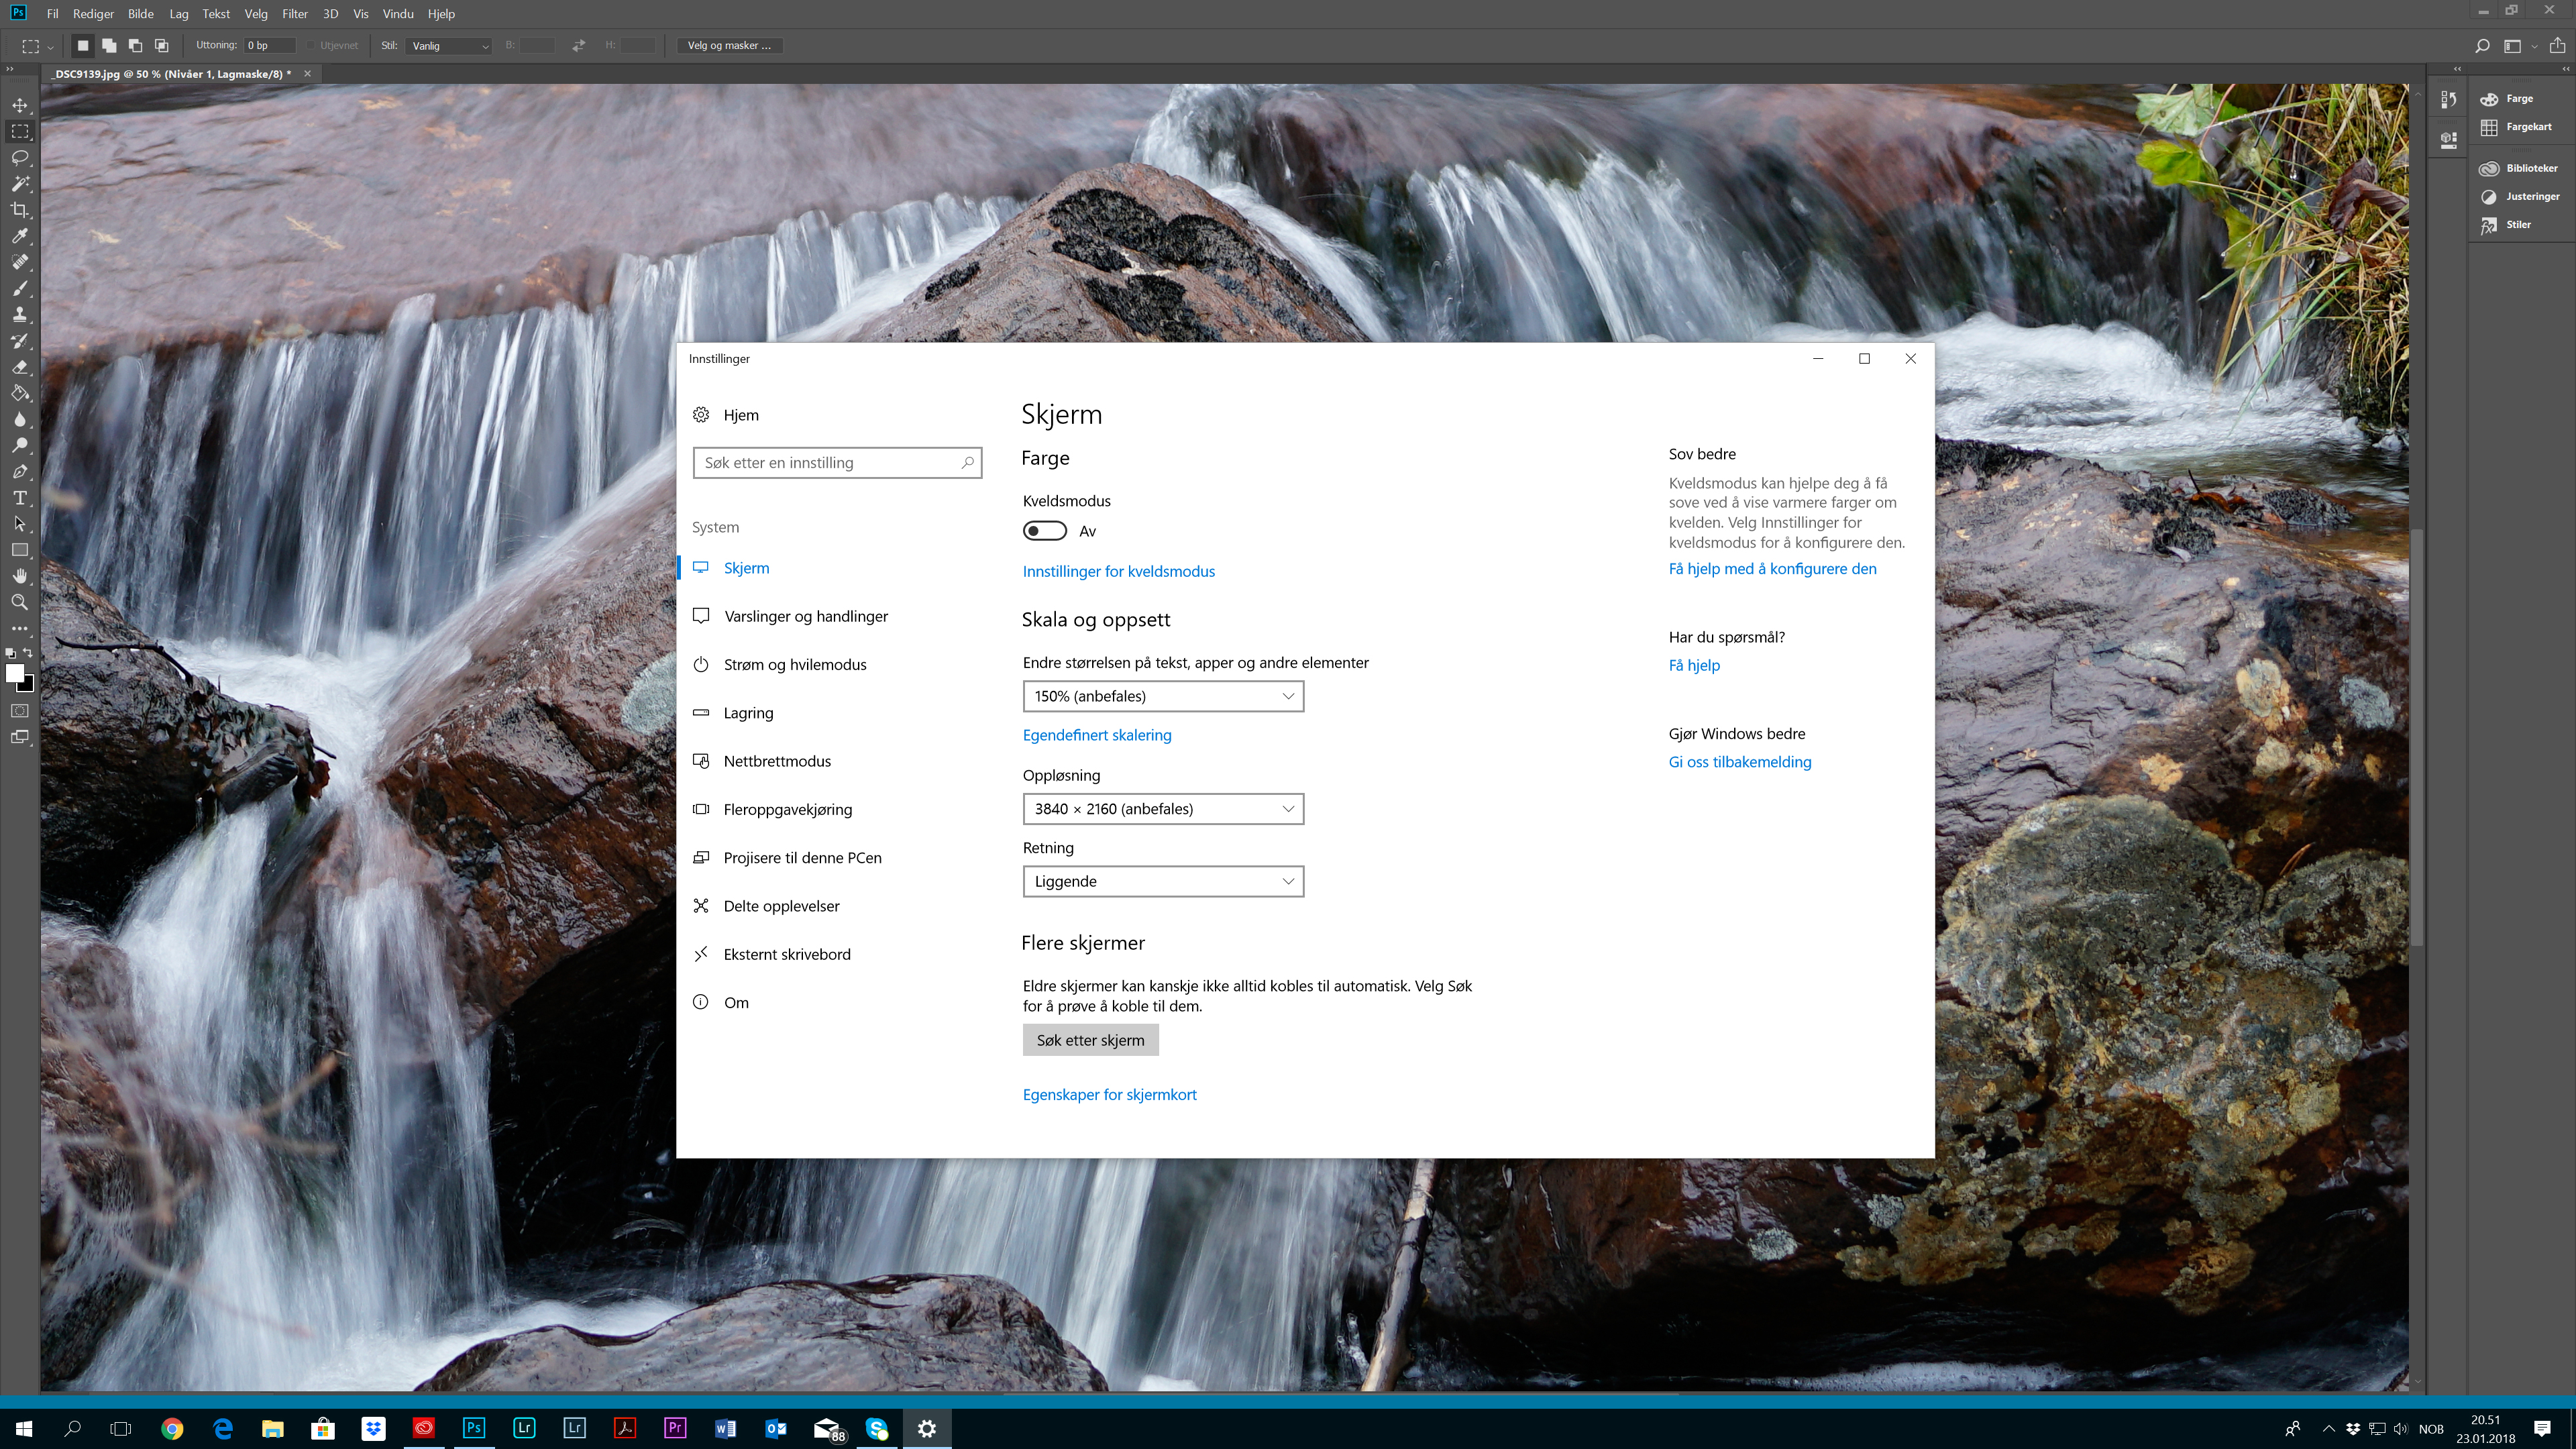 Adobe Photoshop CC 19.1